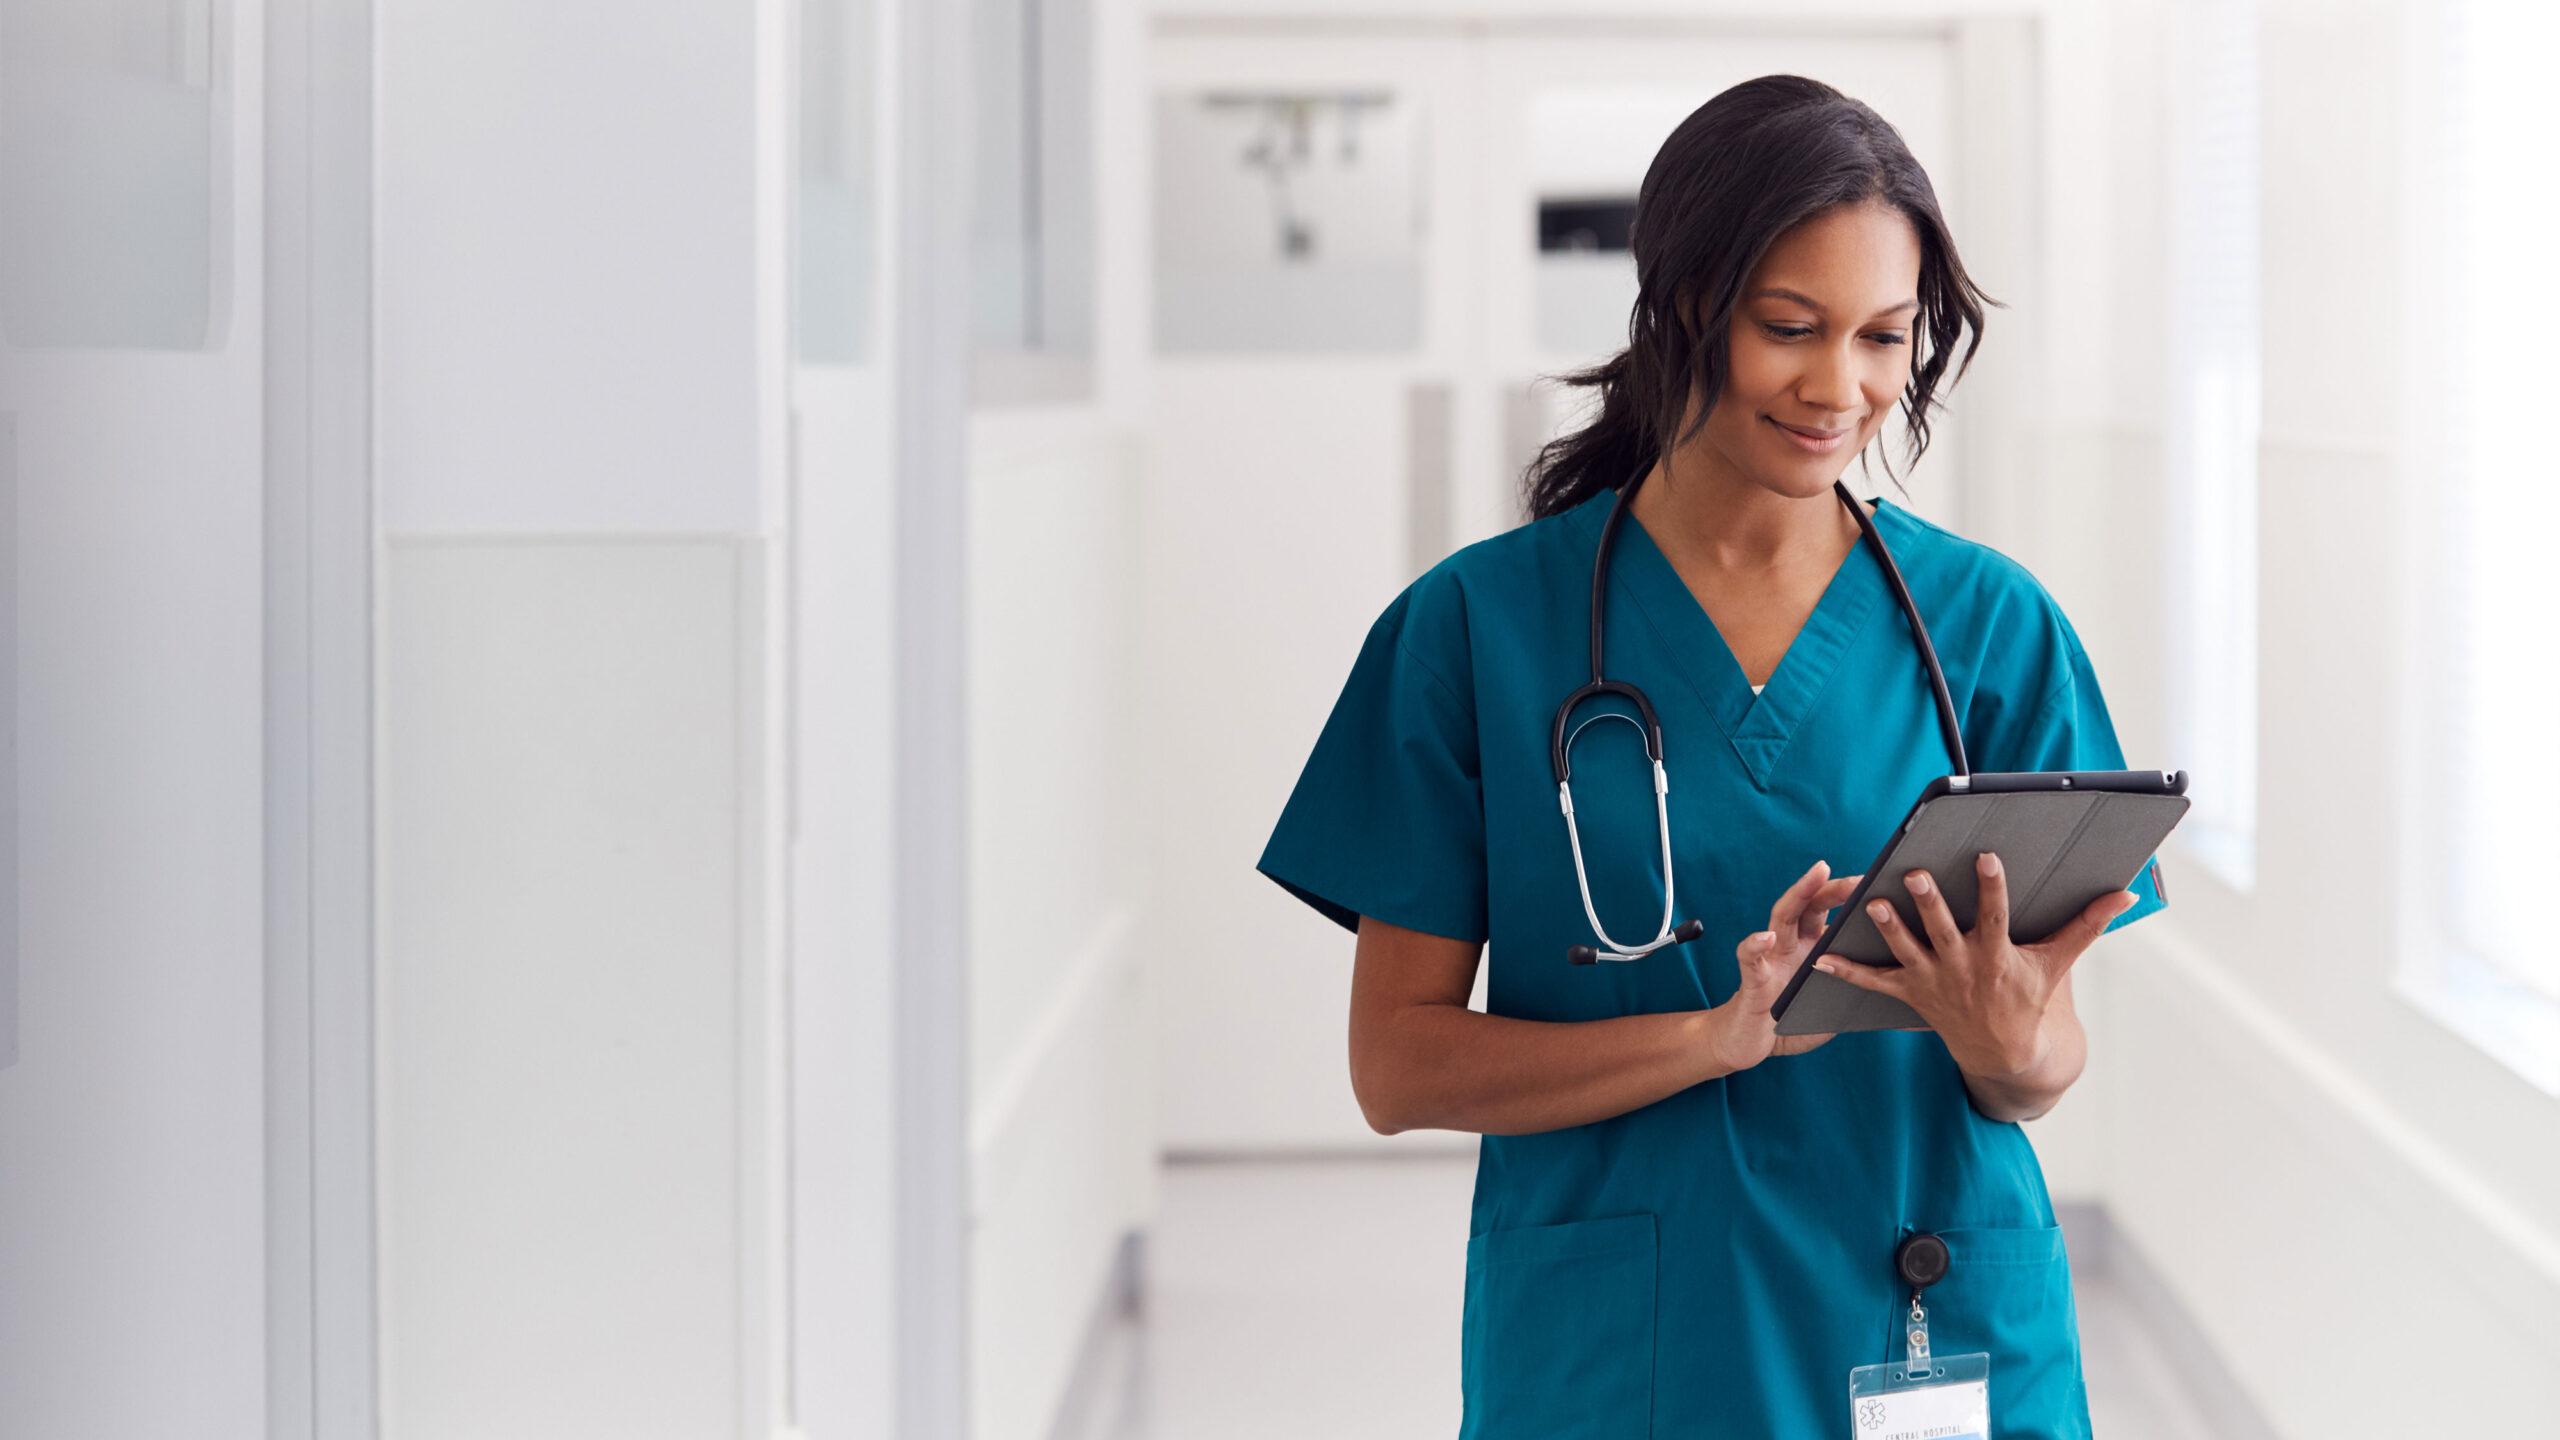 Nurse and Nurse Practitioner